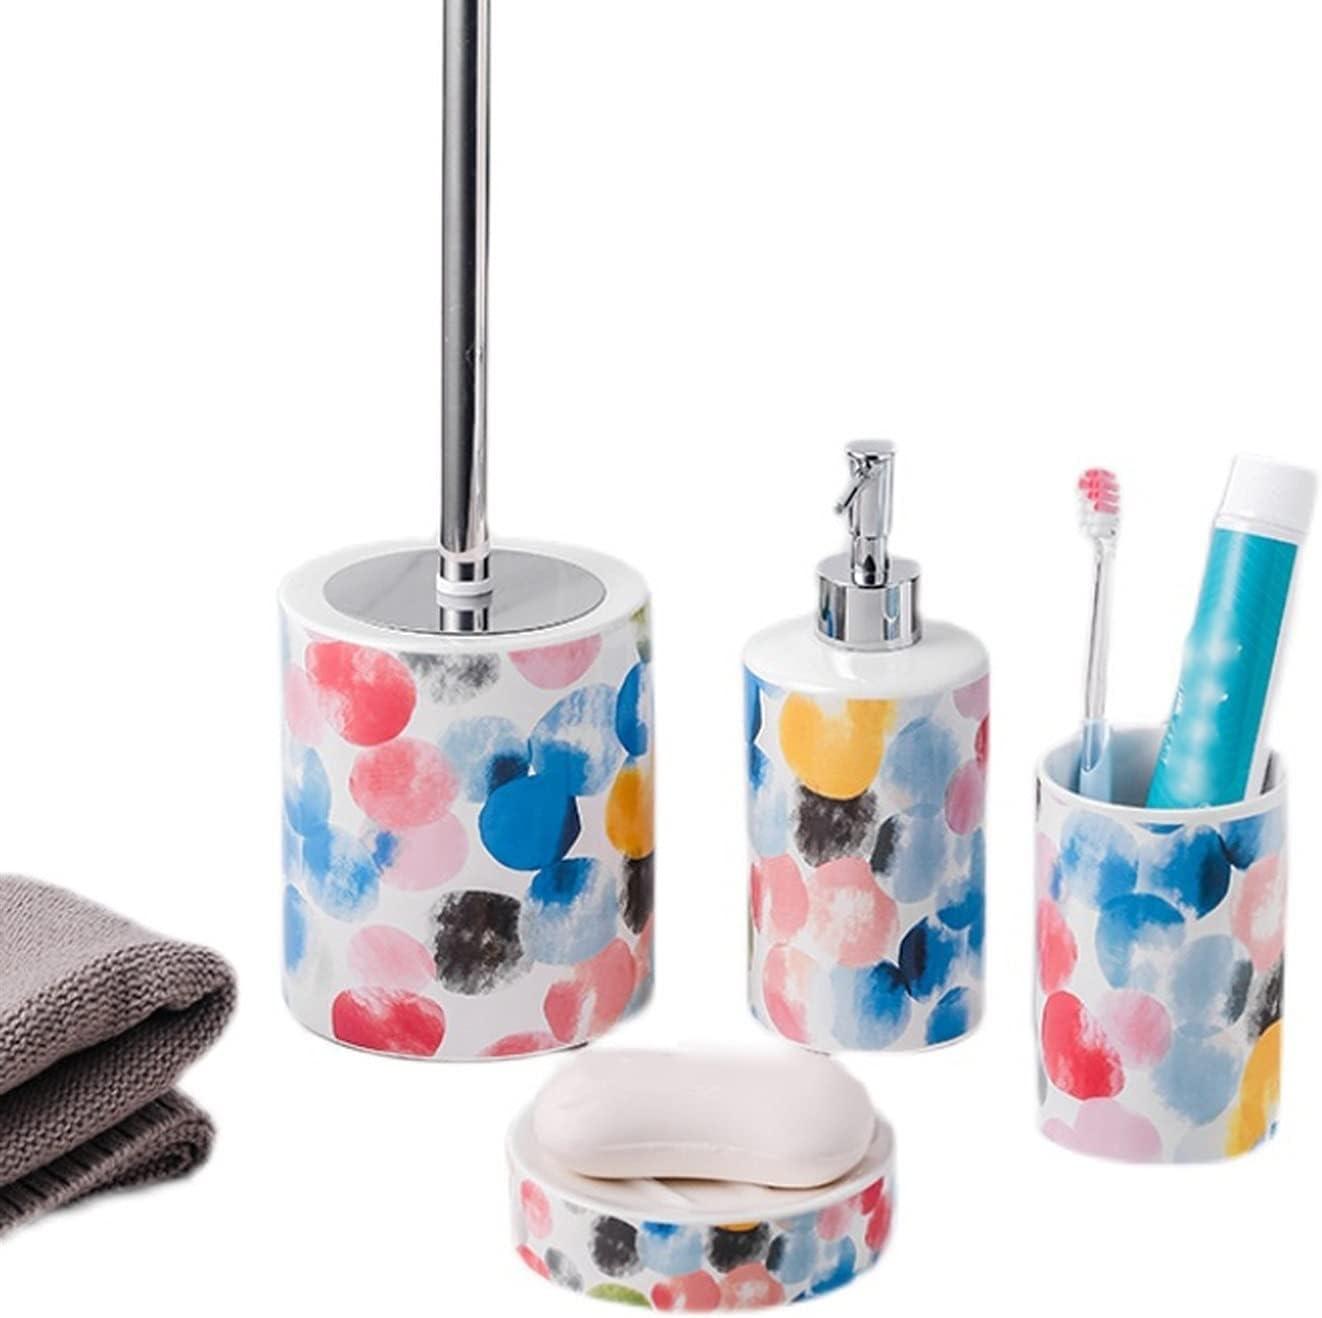 Soap Max 86% OFF Finally popular brand Dispenser Bottle Lotion Dot Pattern Ceram Rainbow